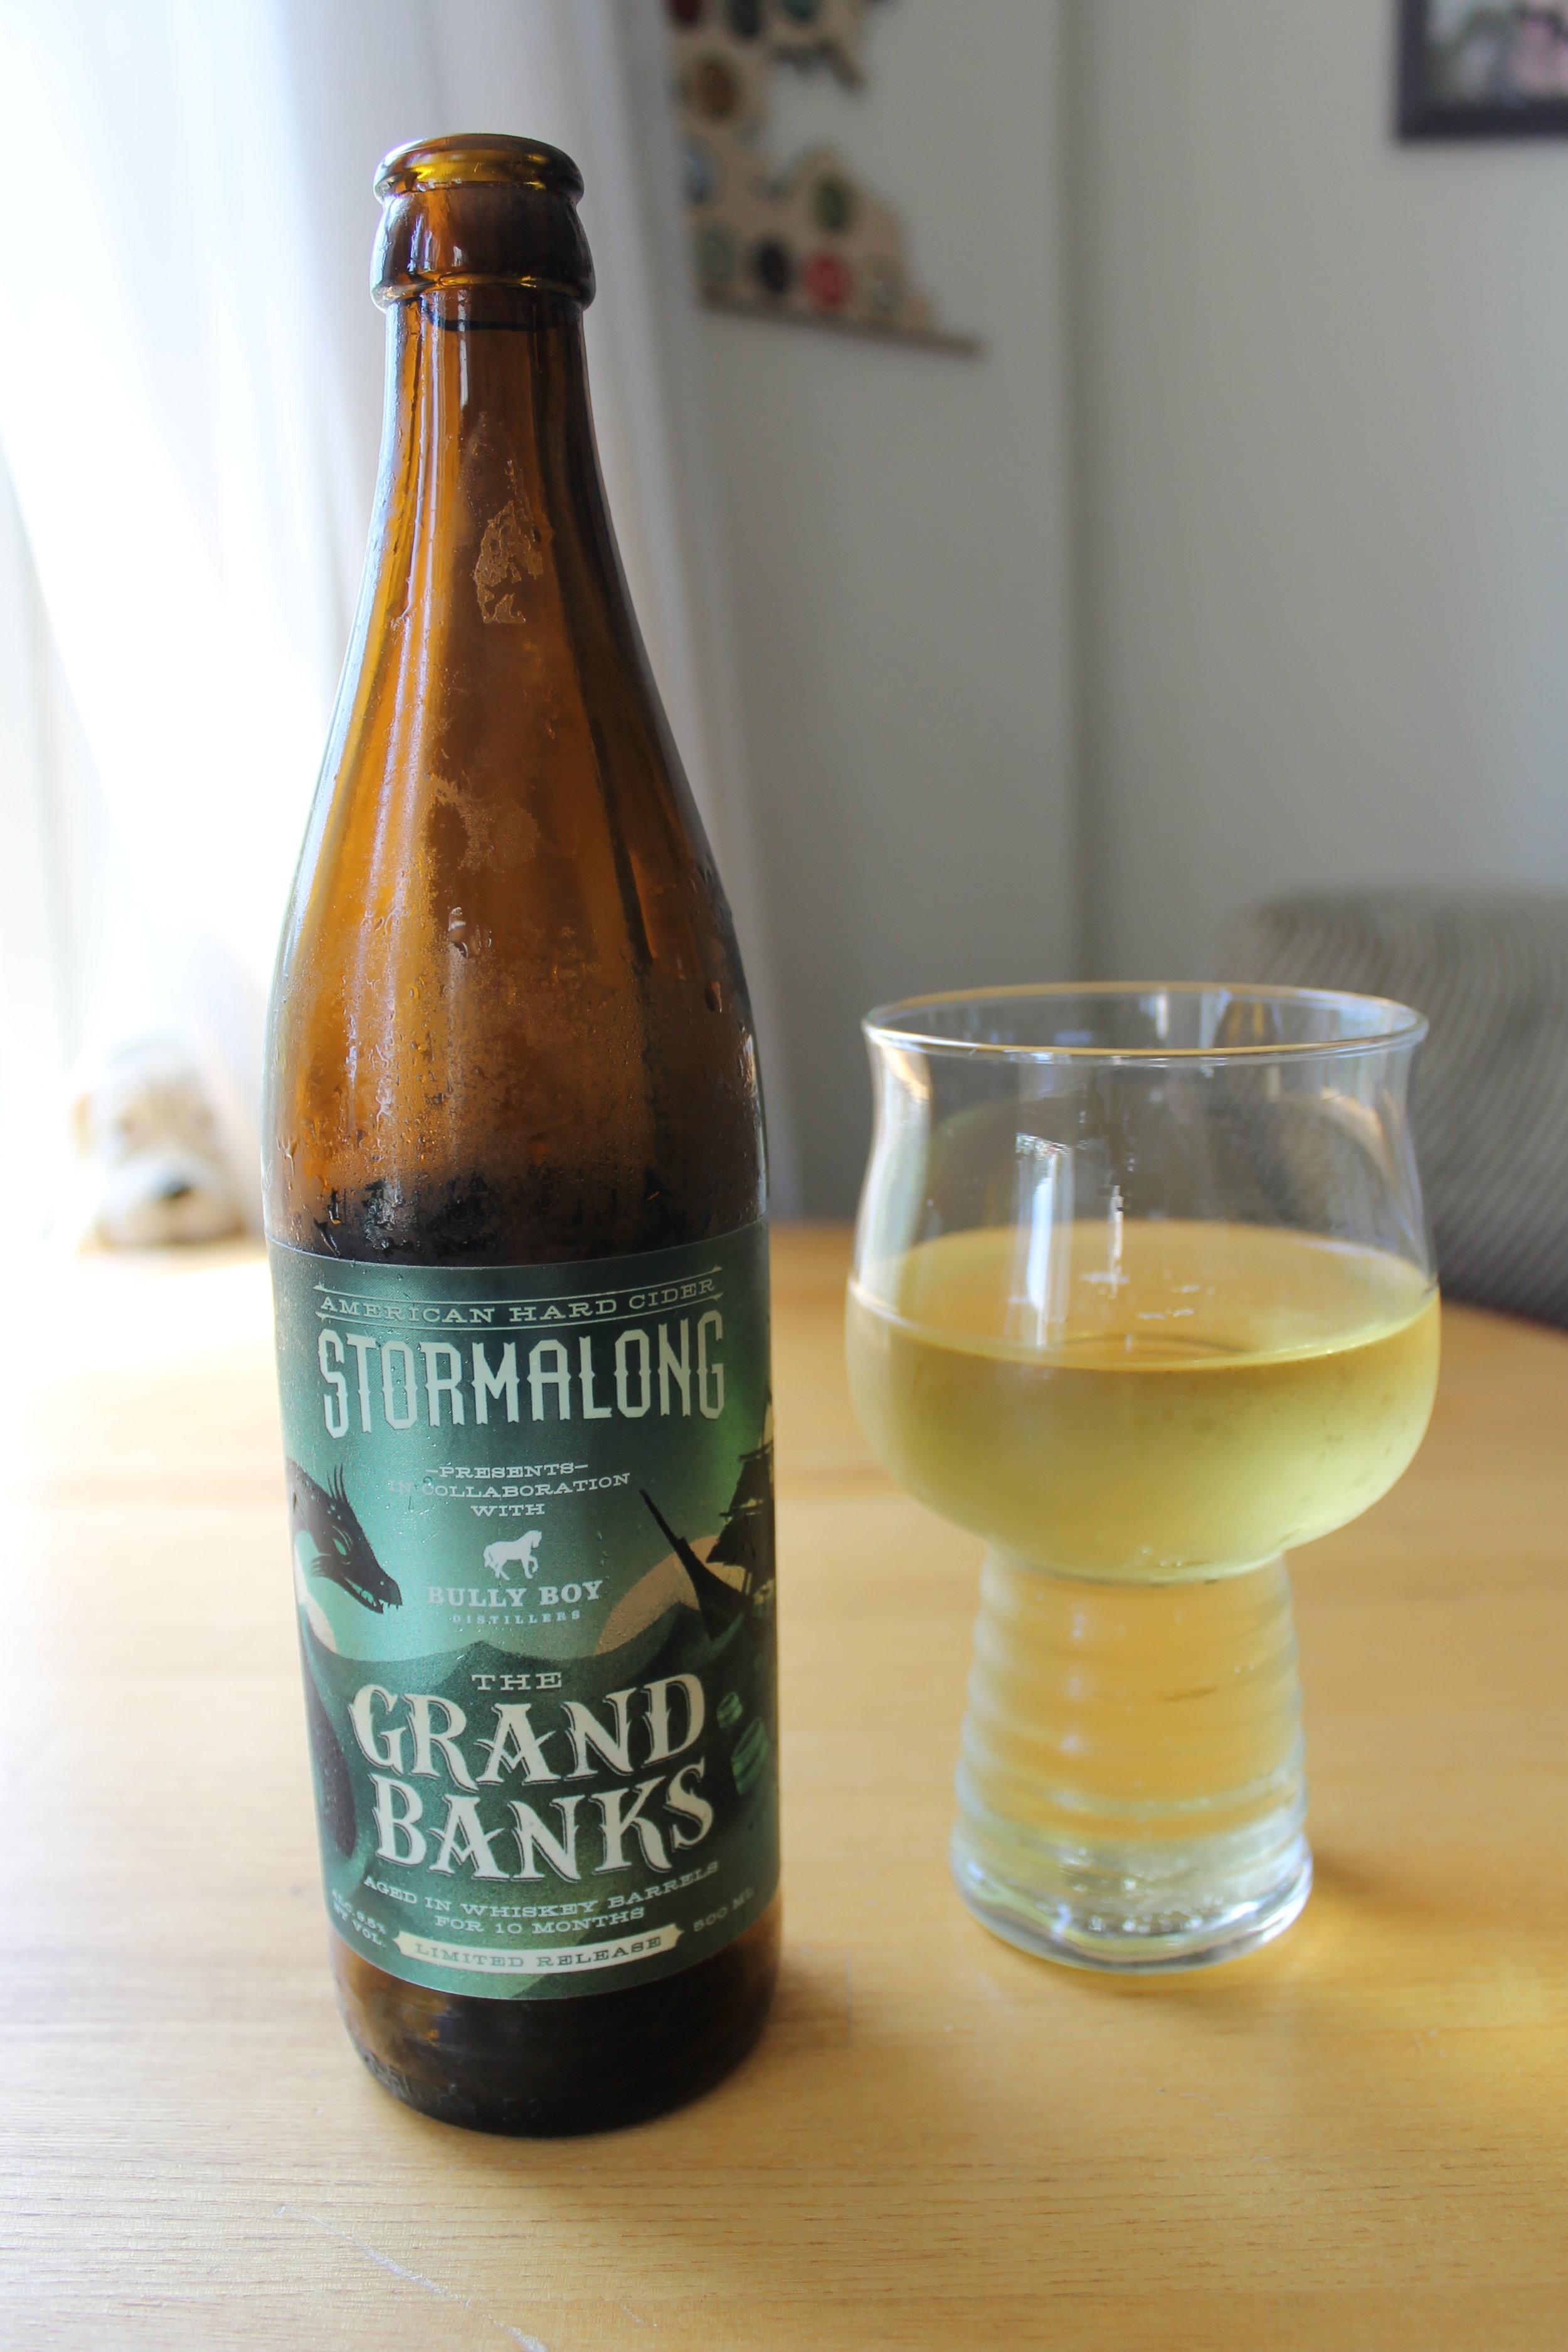 Stormalong Cider: The Grand Banks - Whiskey Barrel Aged